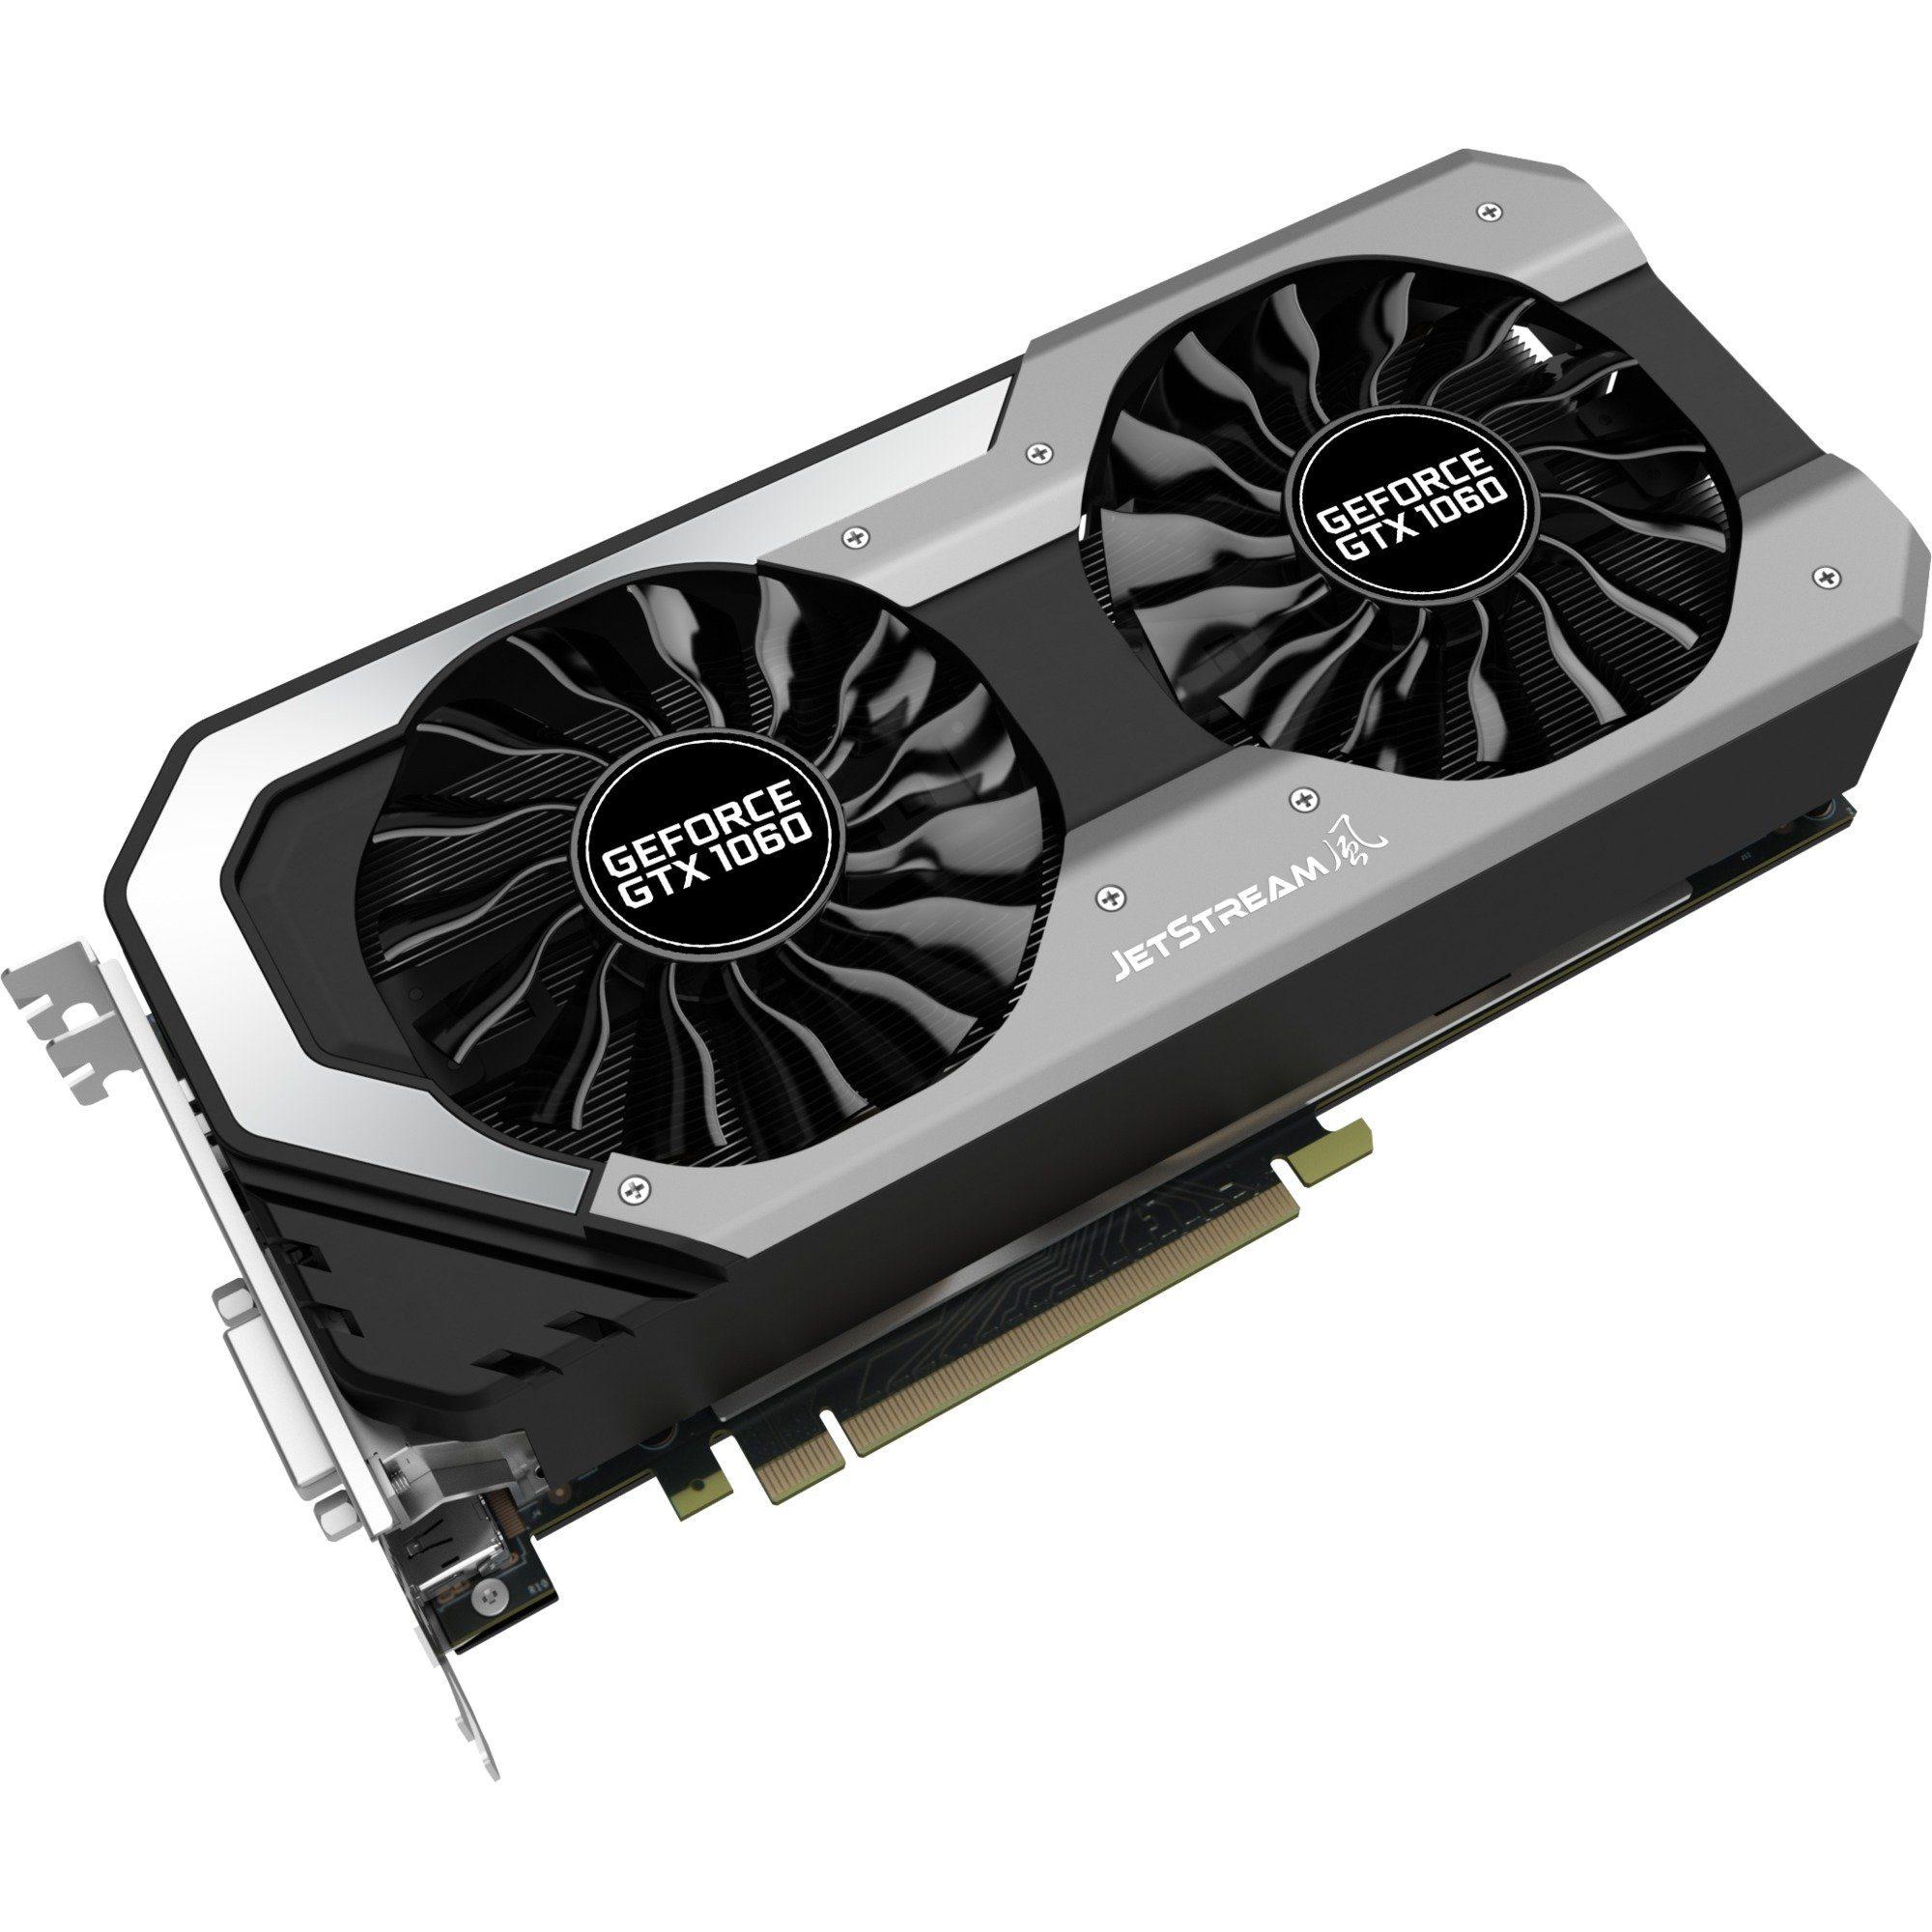 Palit Grafikkarte »GeForce GTX 1060 Jetstream«